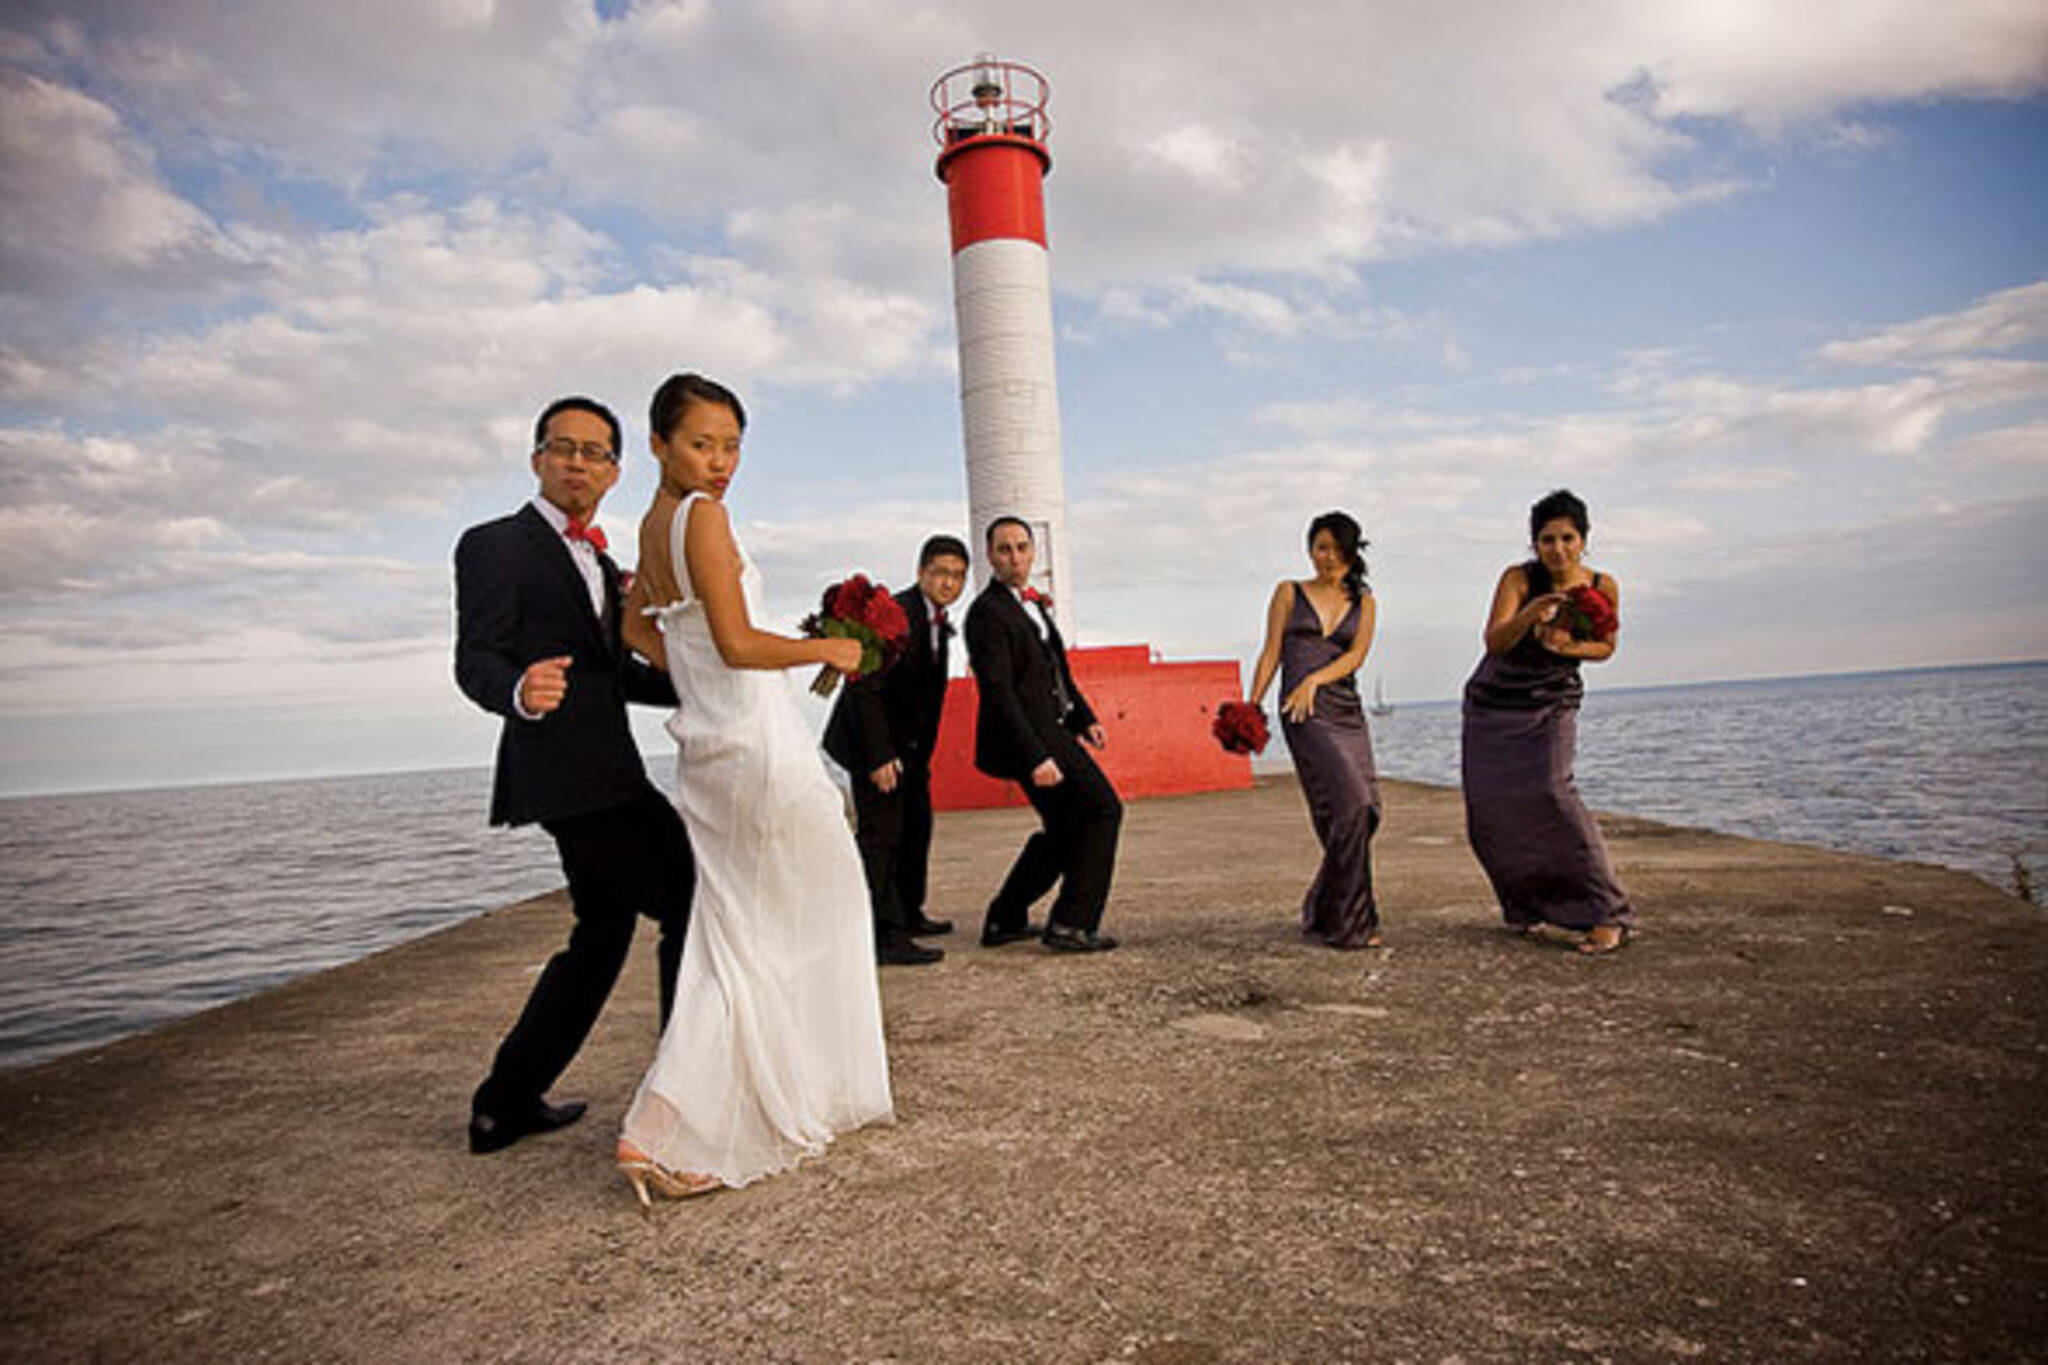 toronto wedding shows 2013